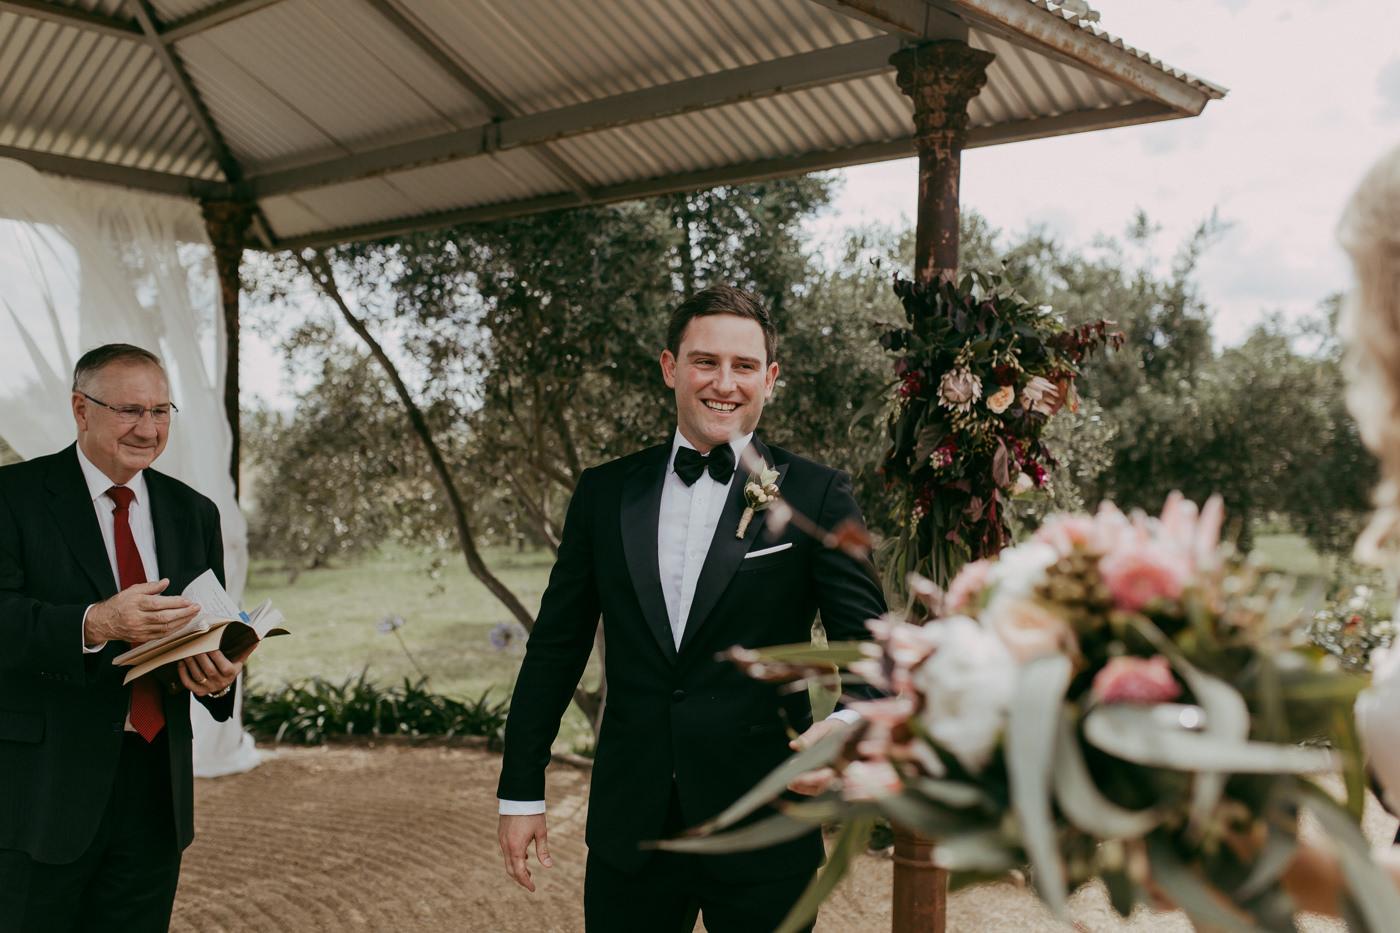 Anthony & Eliet - Wagga Wagga Wedding - Country NSW - Samantha Heather Photography-97.jpg